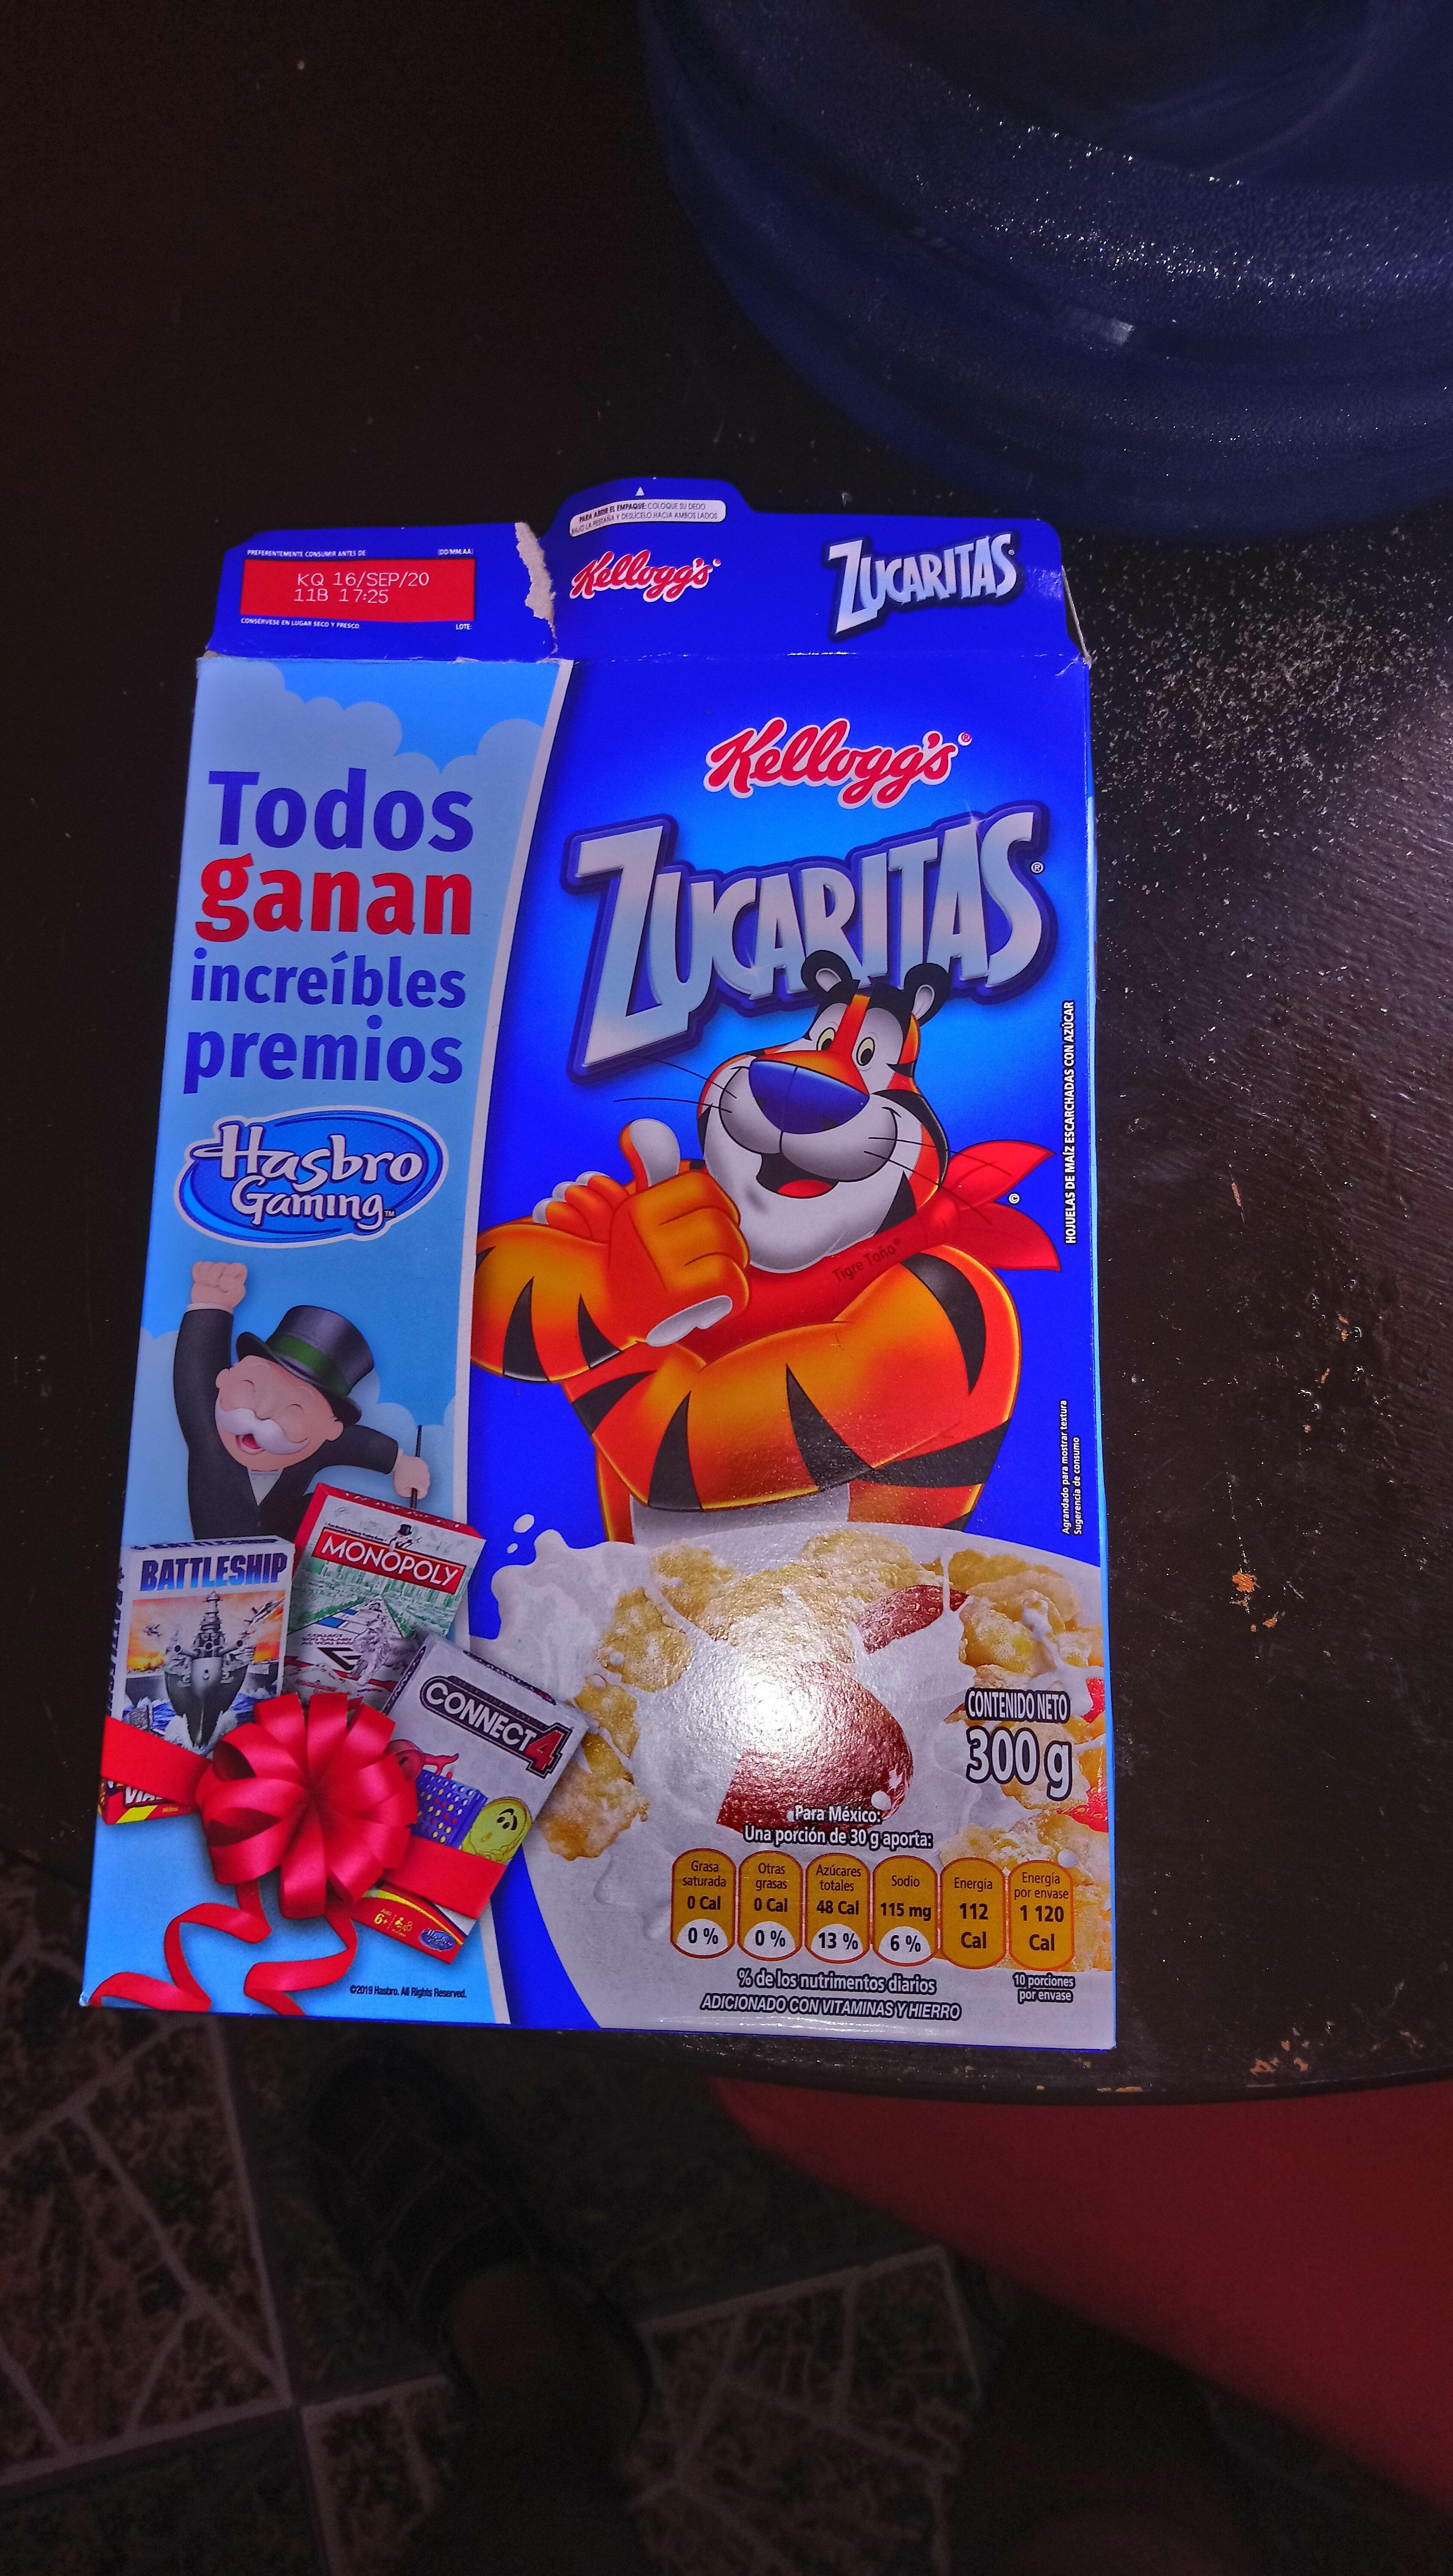 zucaritas - Product